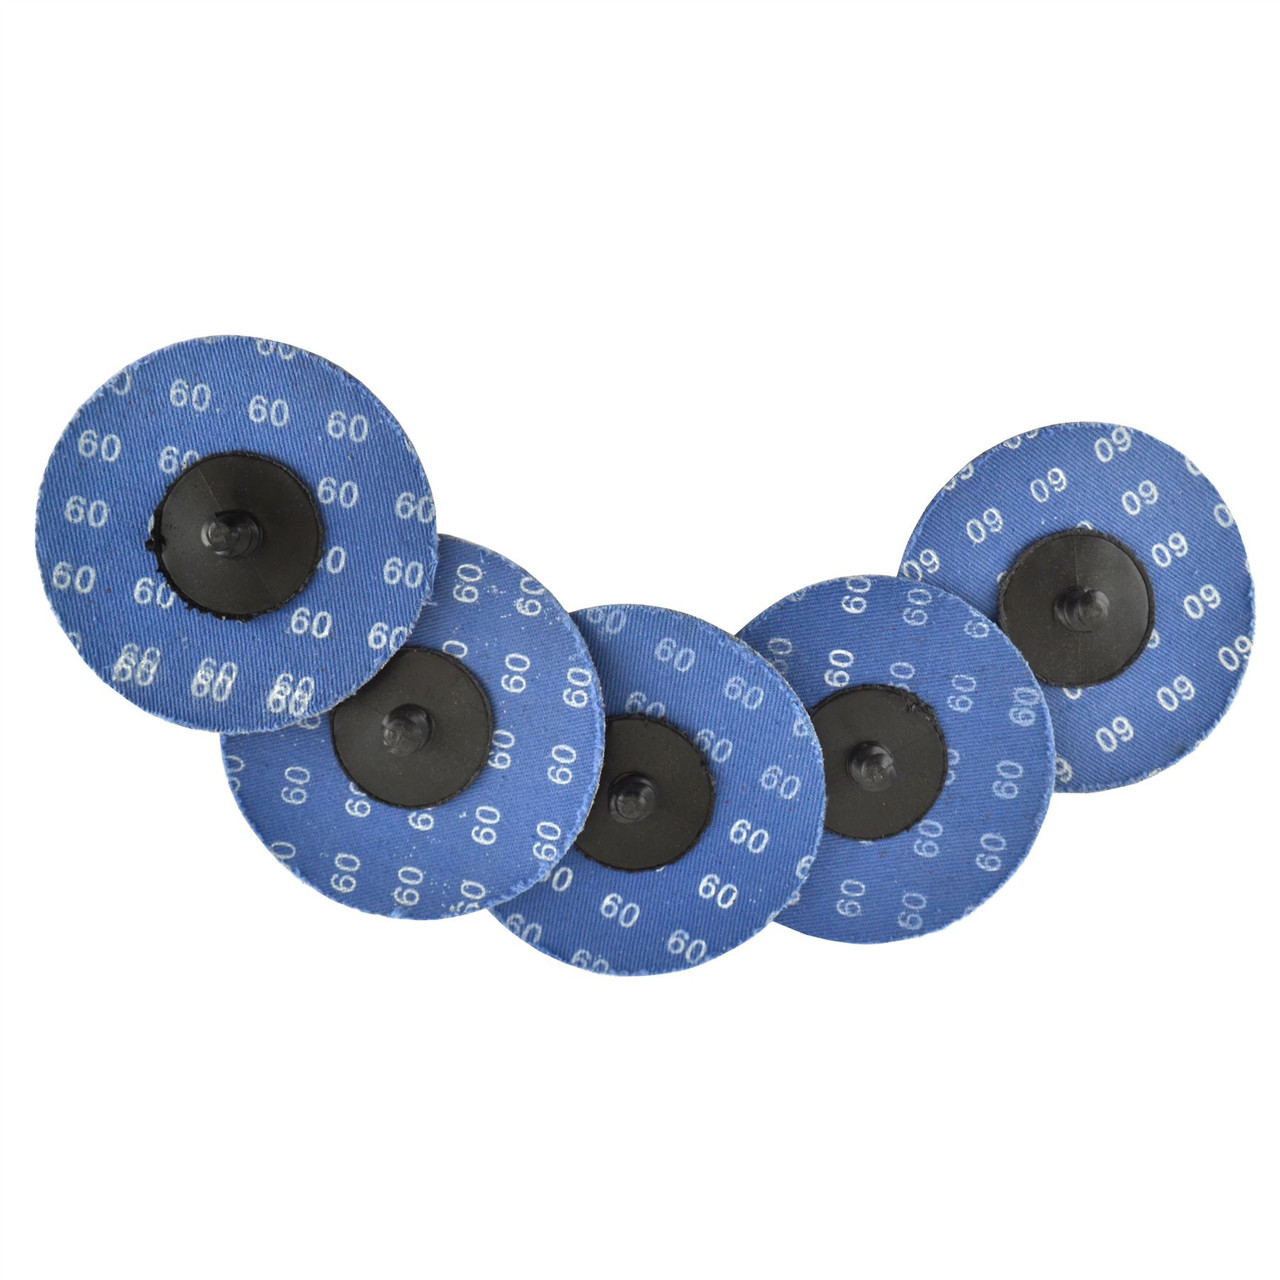 5pk Flap Disc Set 75mm Twist Button Abrasive Discs Sanding 60 Grit SIL152